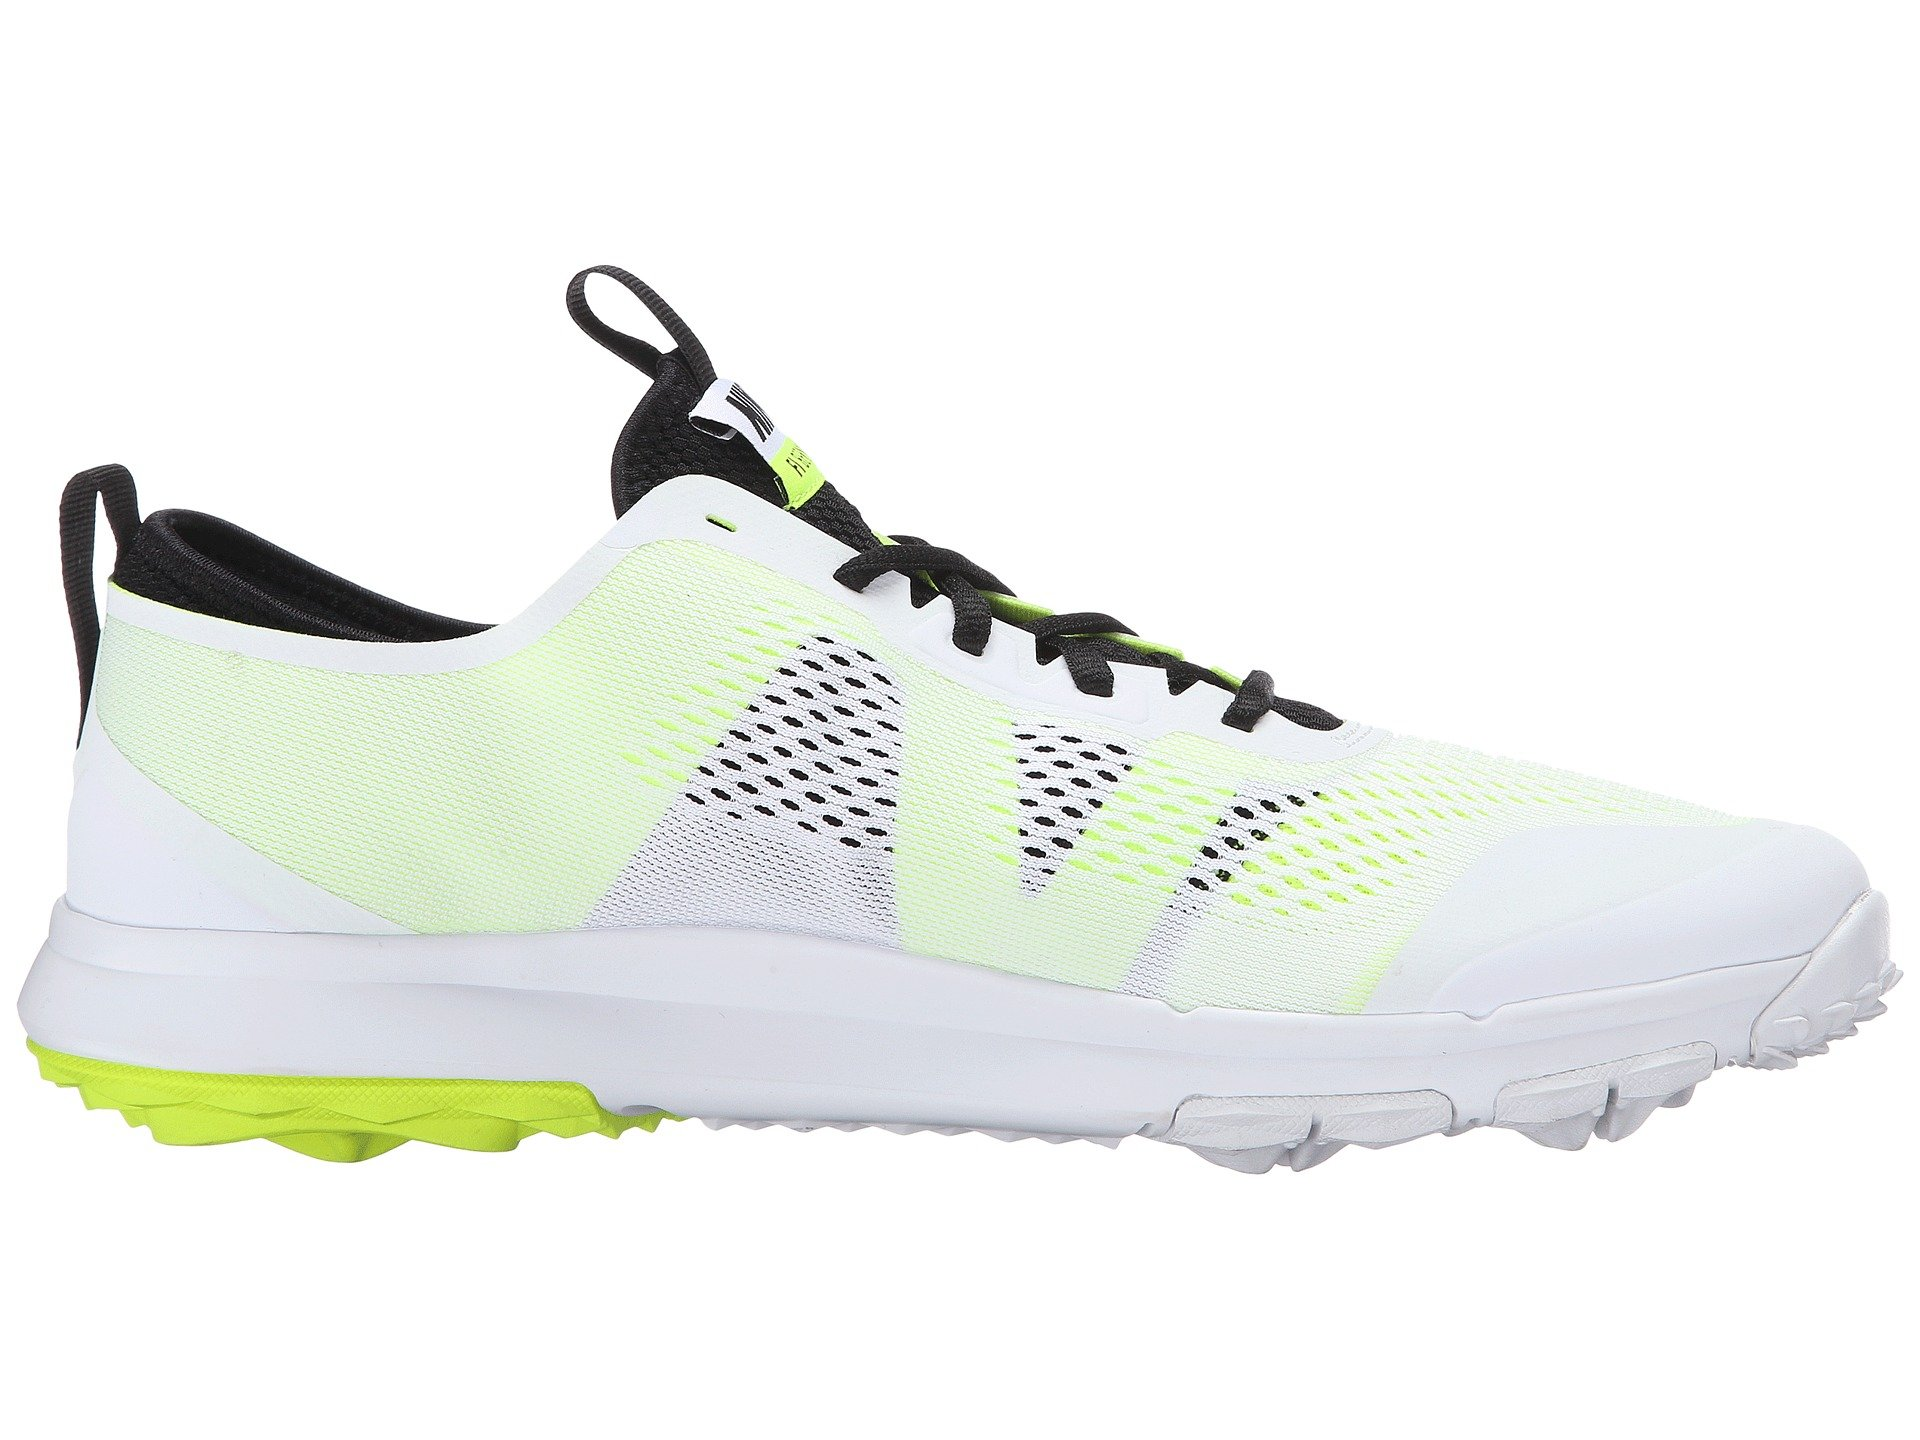 Nike F Bermuda Golf Shoes Wide